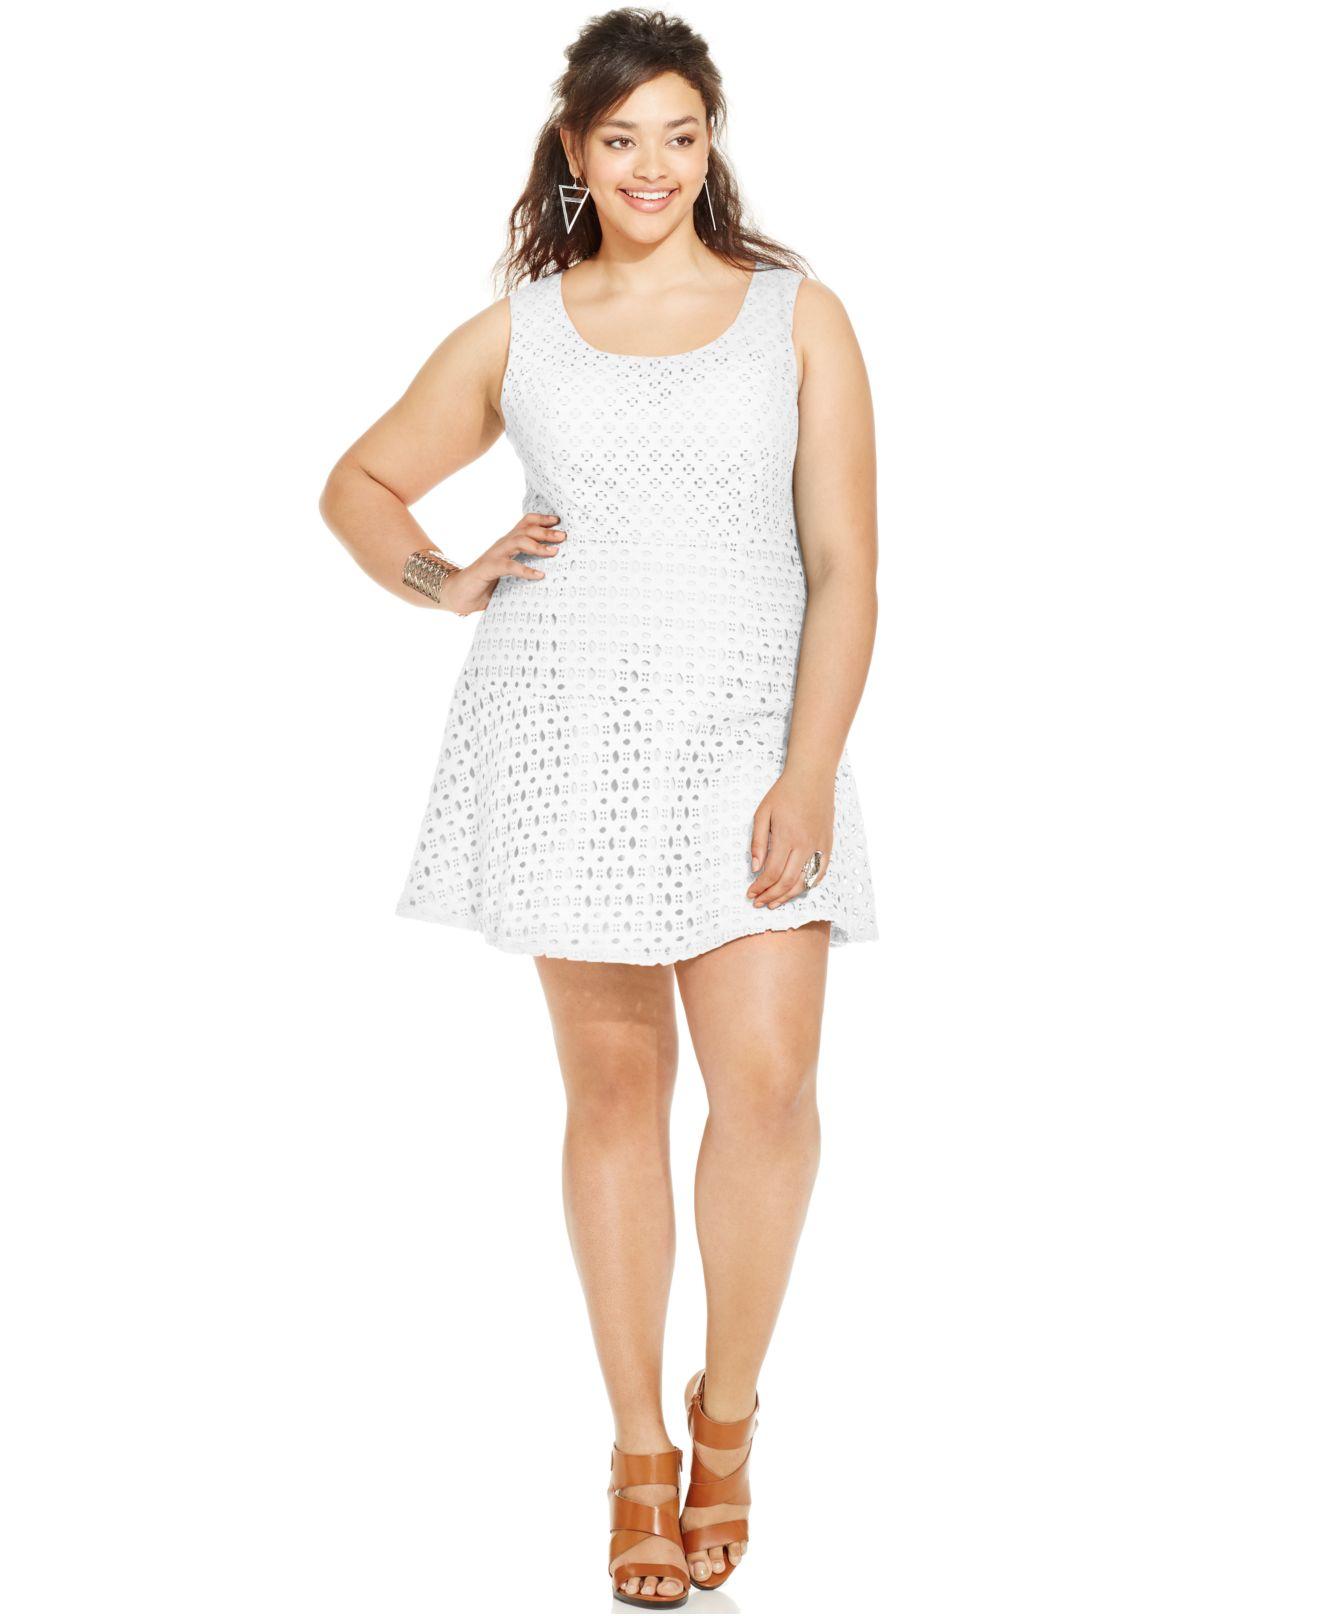 Jessica Simpson Plus Size Sleeveless Eyelet Flare Dress in White - Lyst